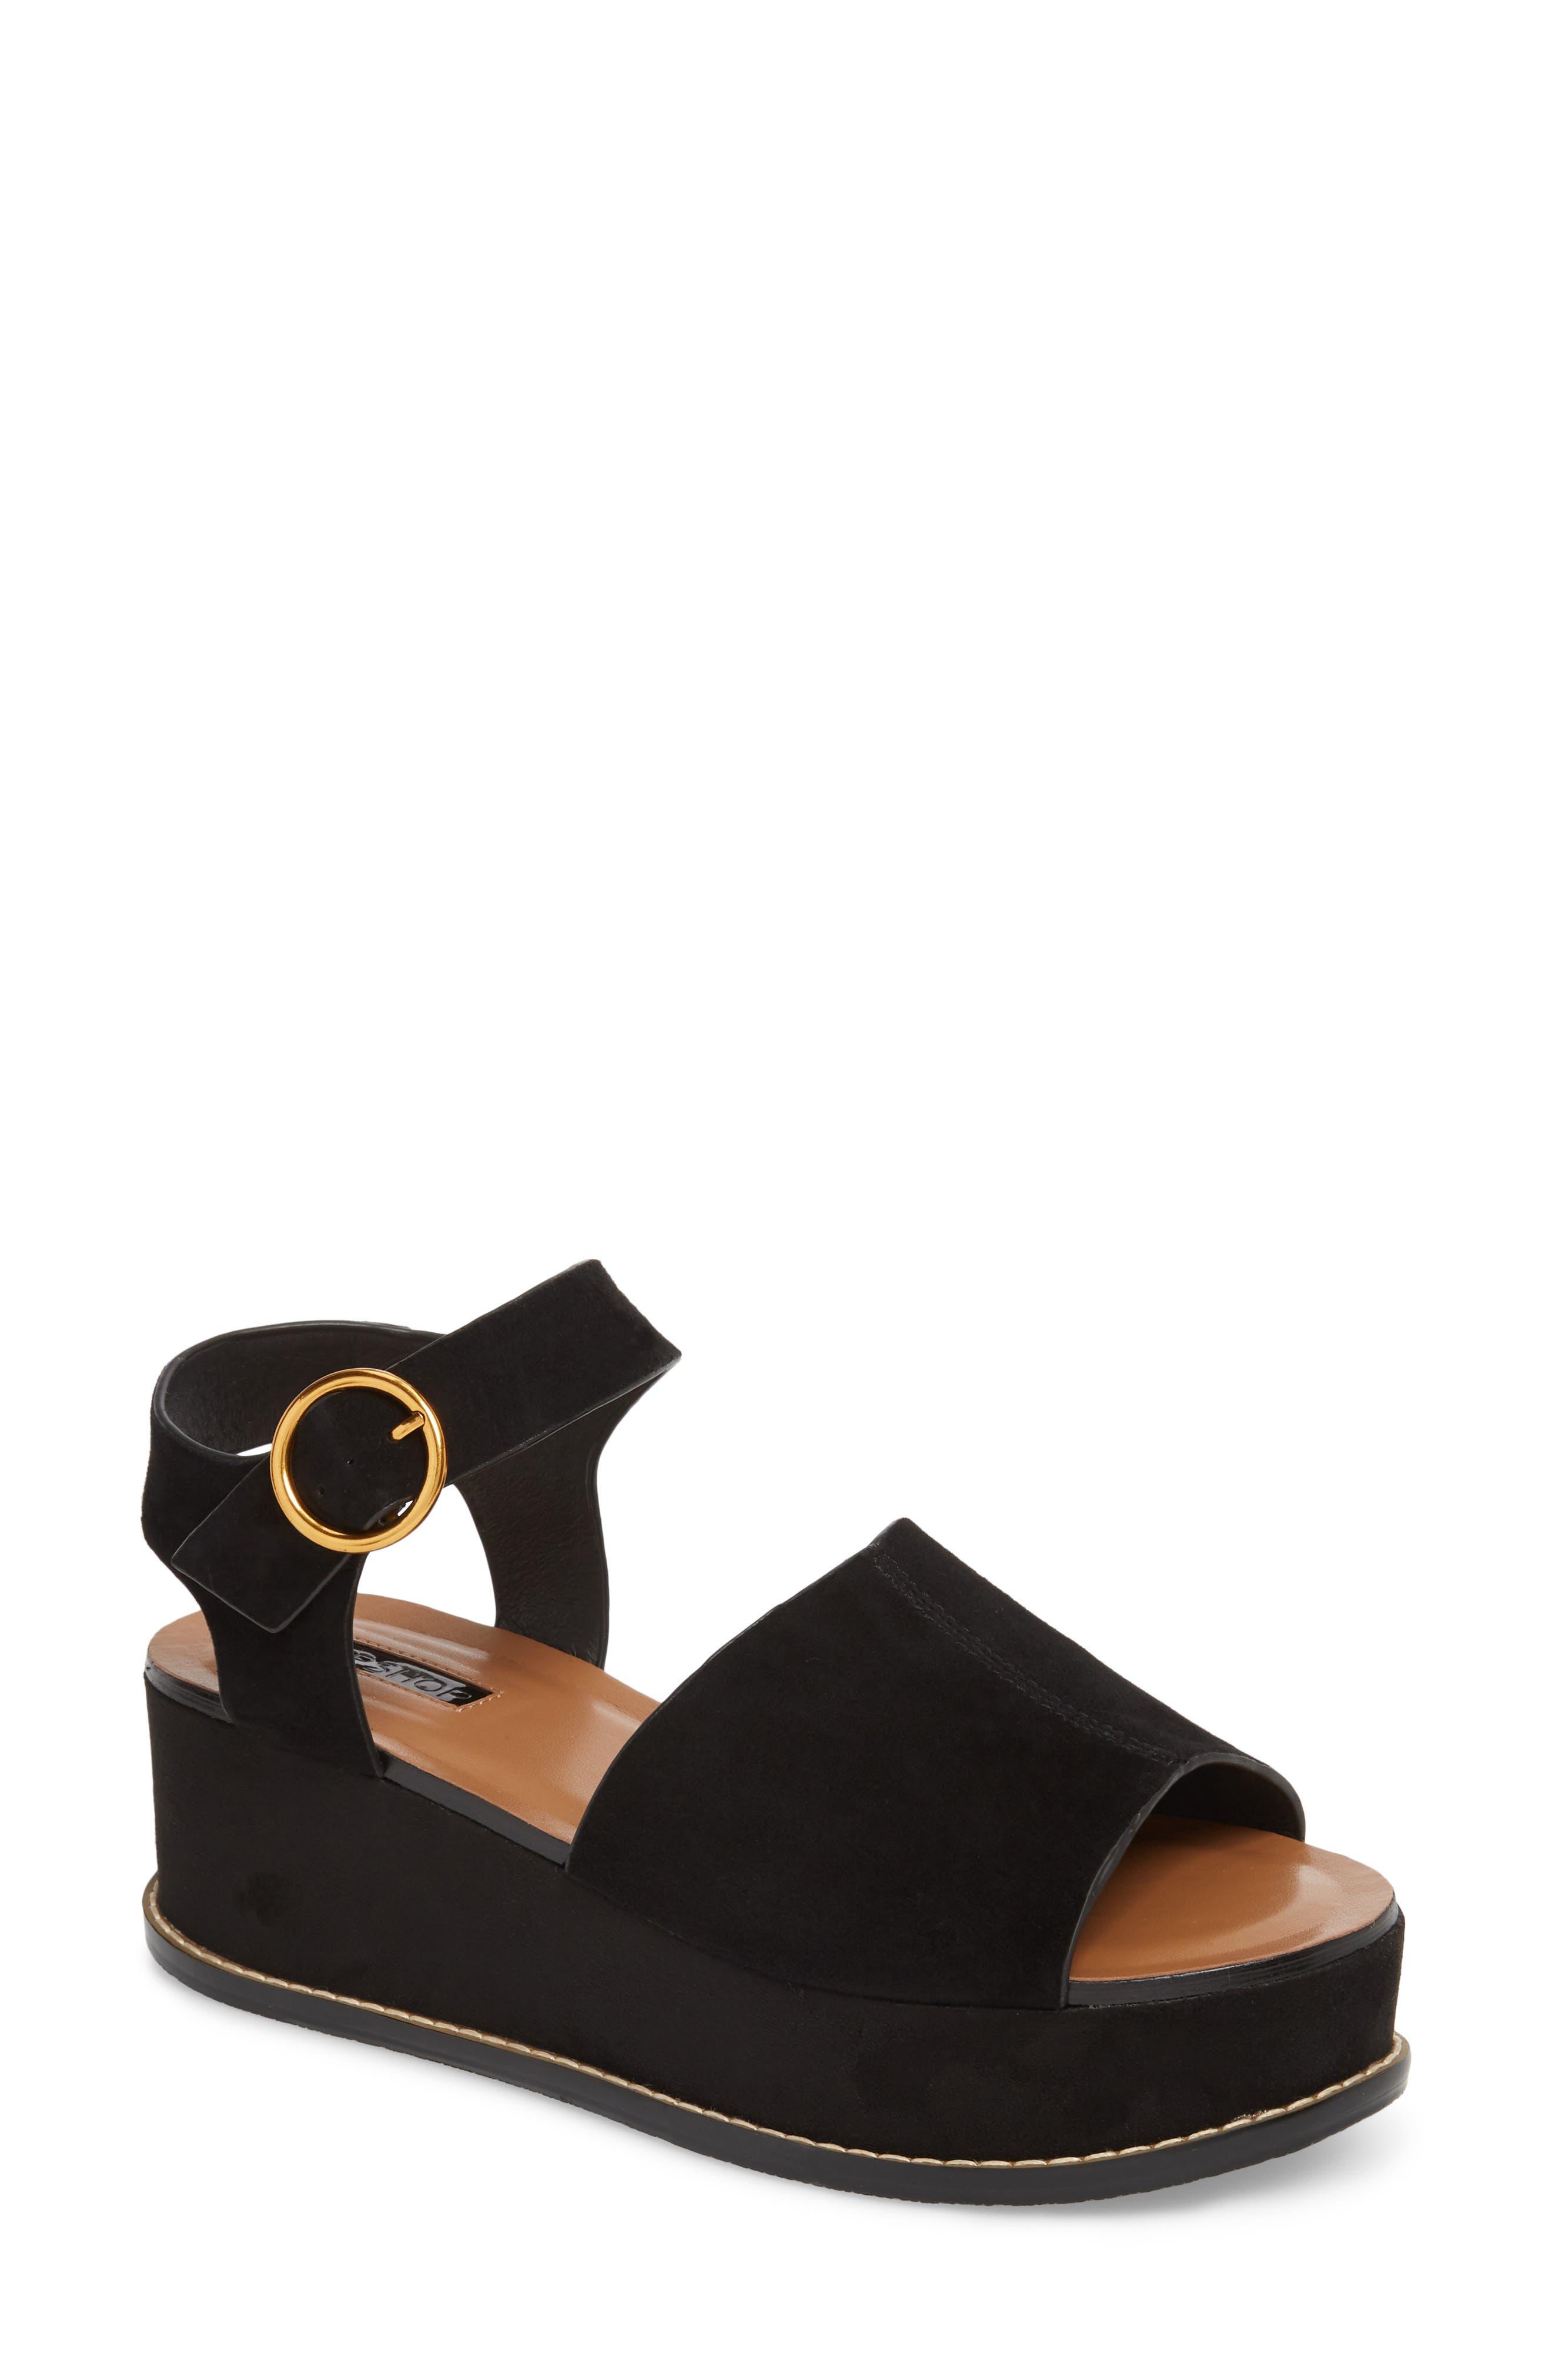 Wow Platform Wedge Sandal,                         Main,                         color, Black